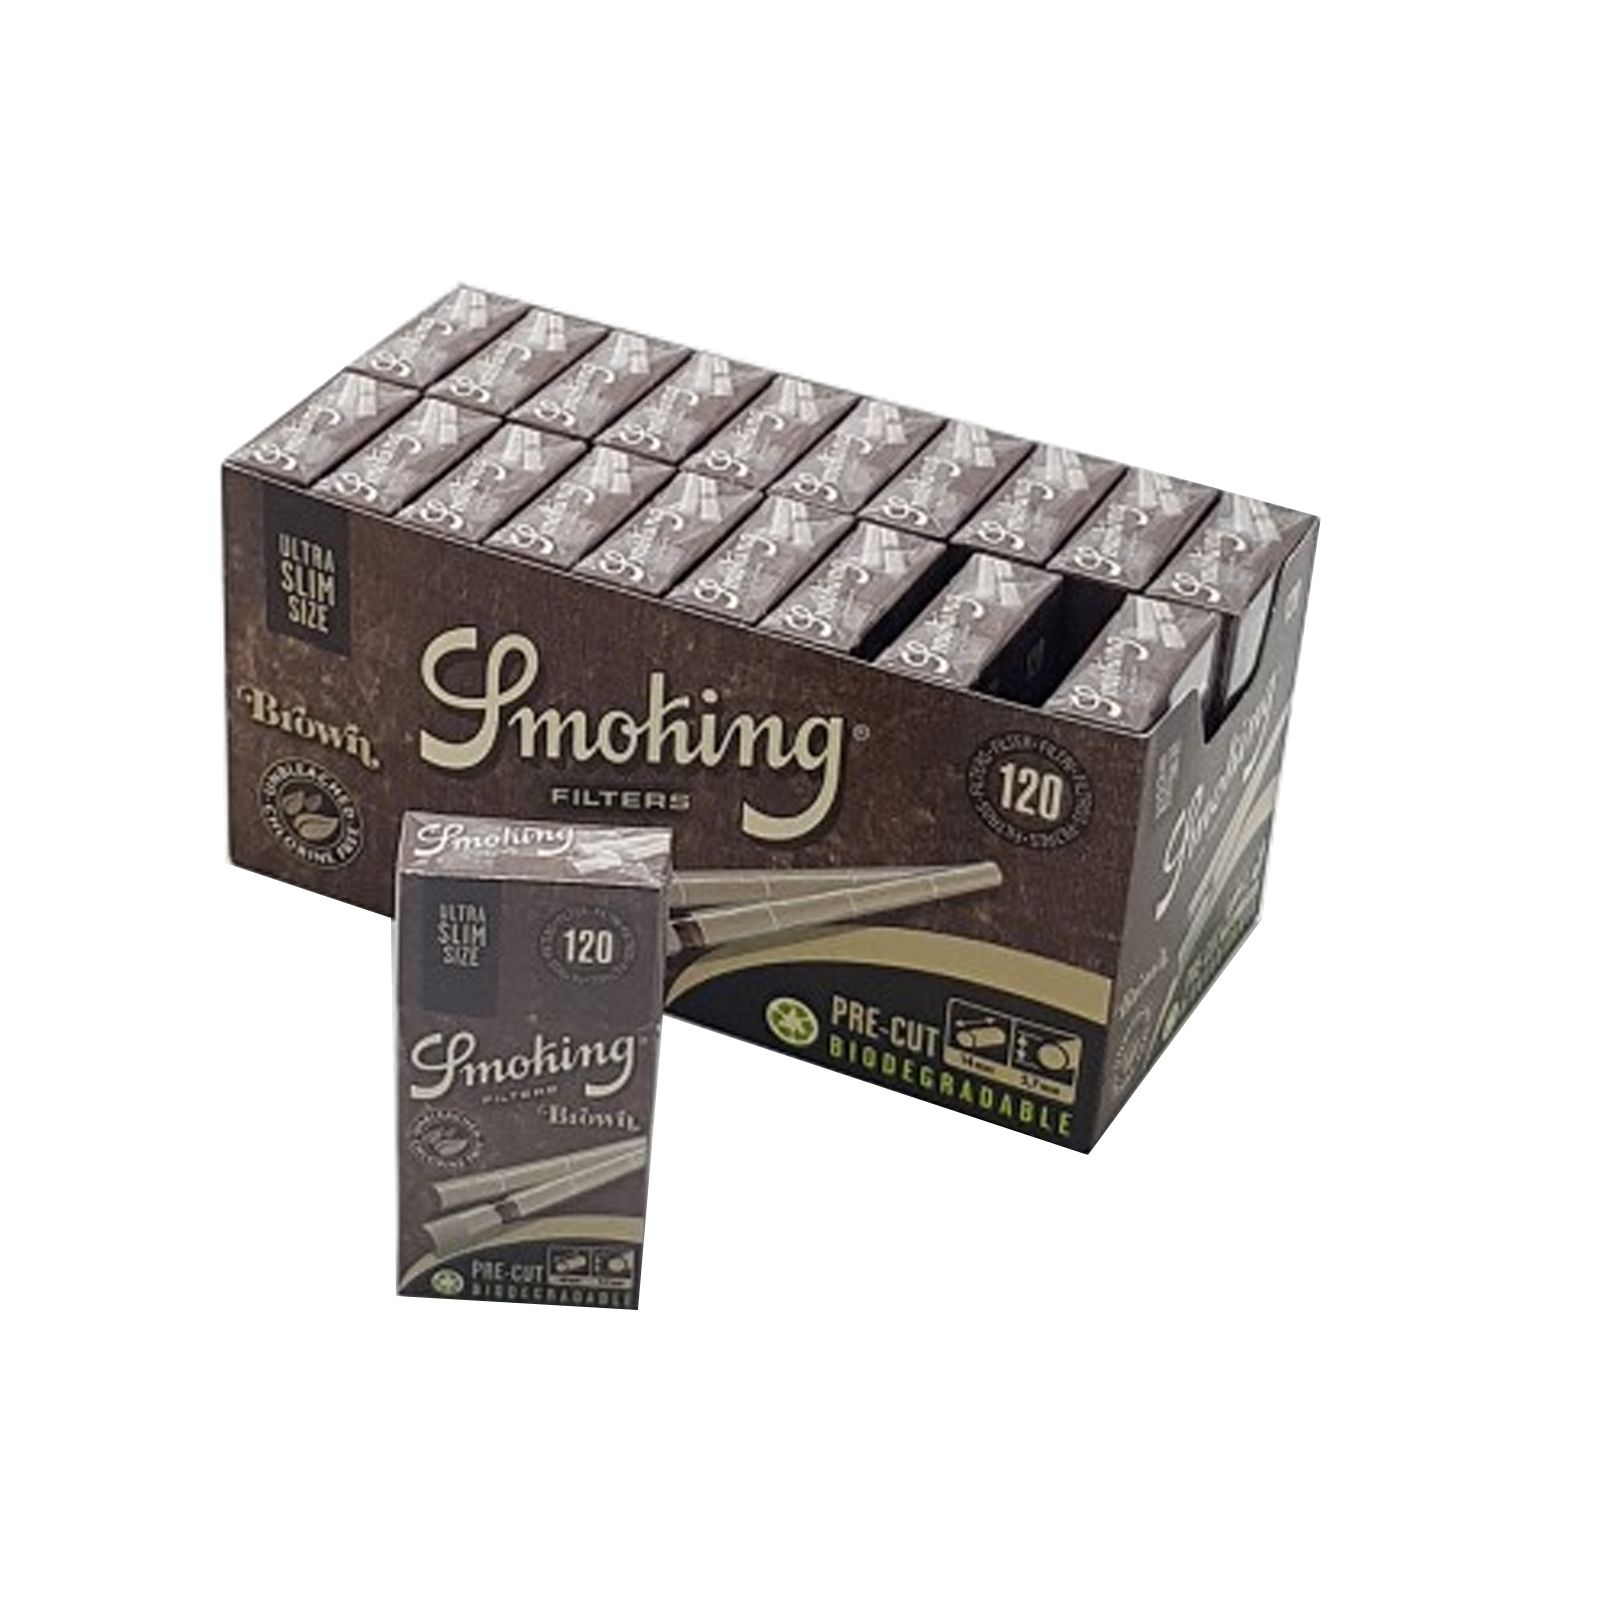 SMOKING FILTRI SLIM 6mm BROWN BIODEGRADABILI.BOX DA 10 BUSTINE DA 120 FILTRI